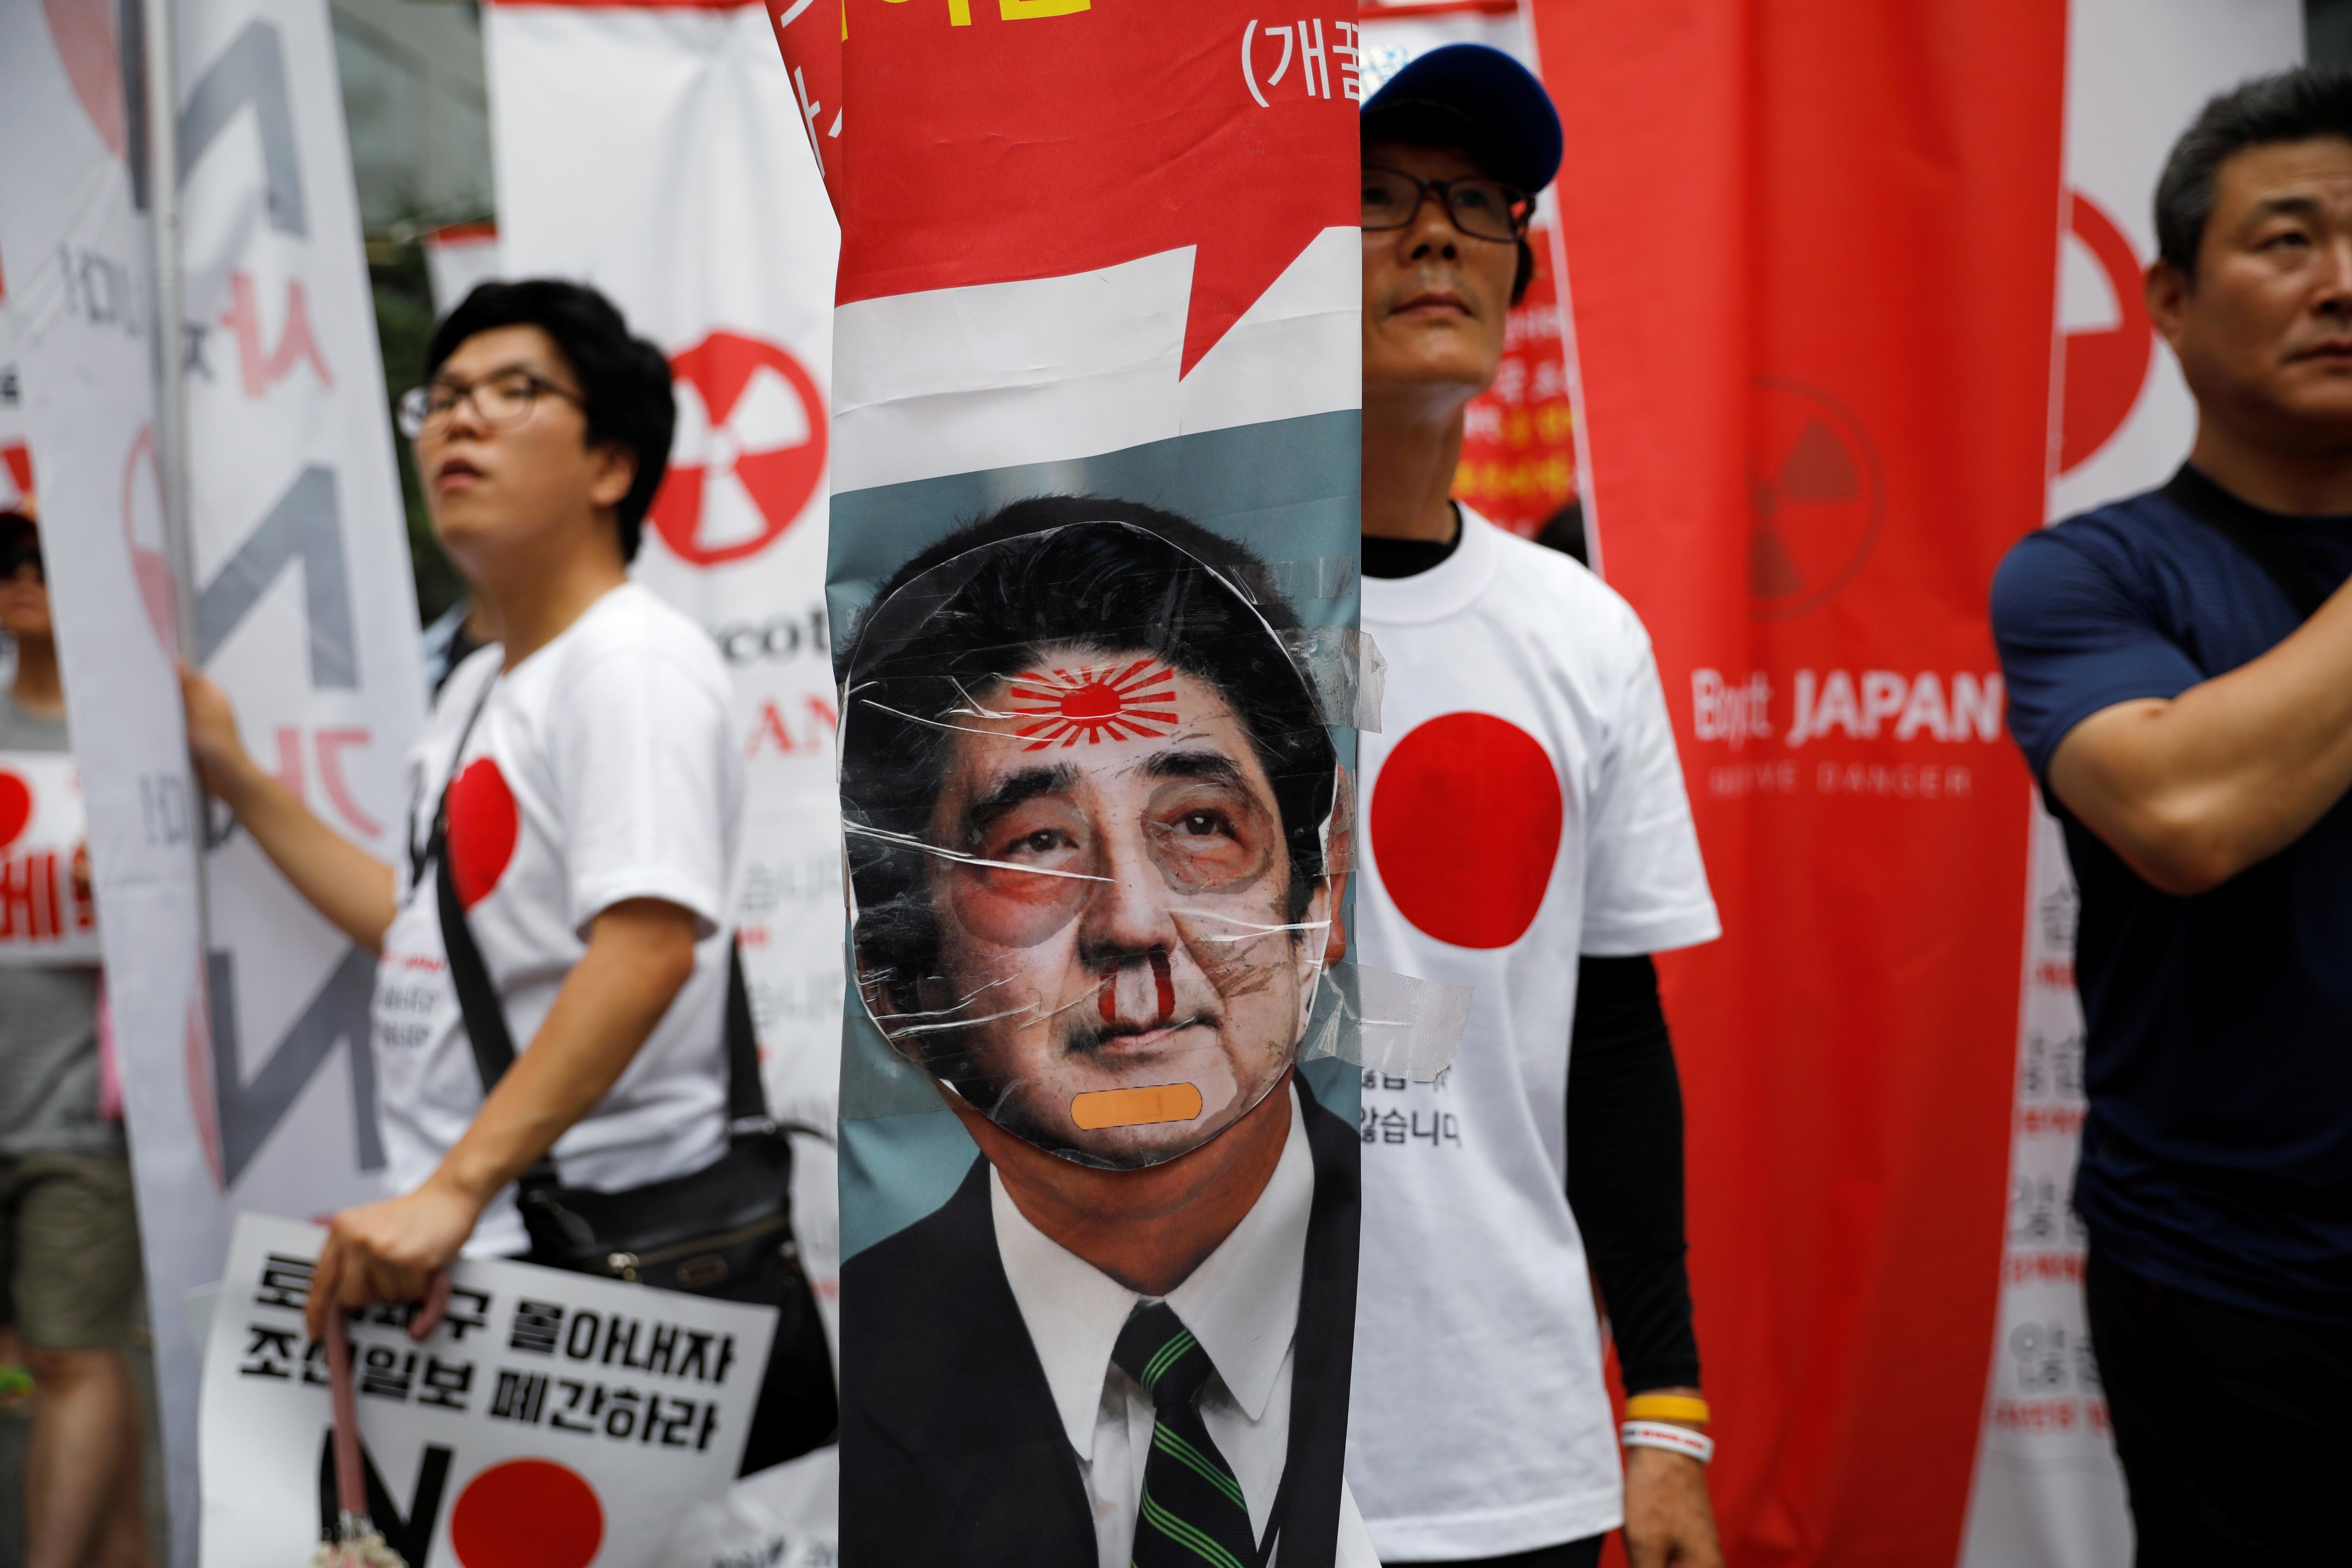 South Koreans protesting against Japan